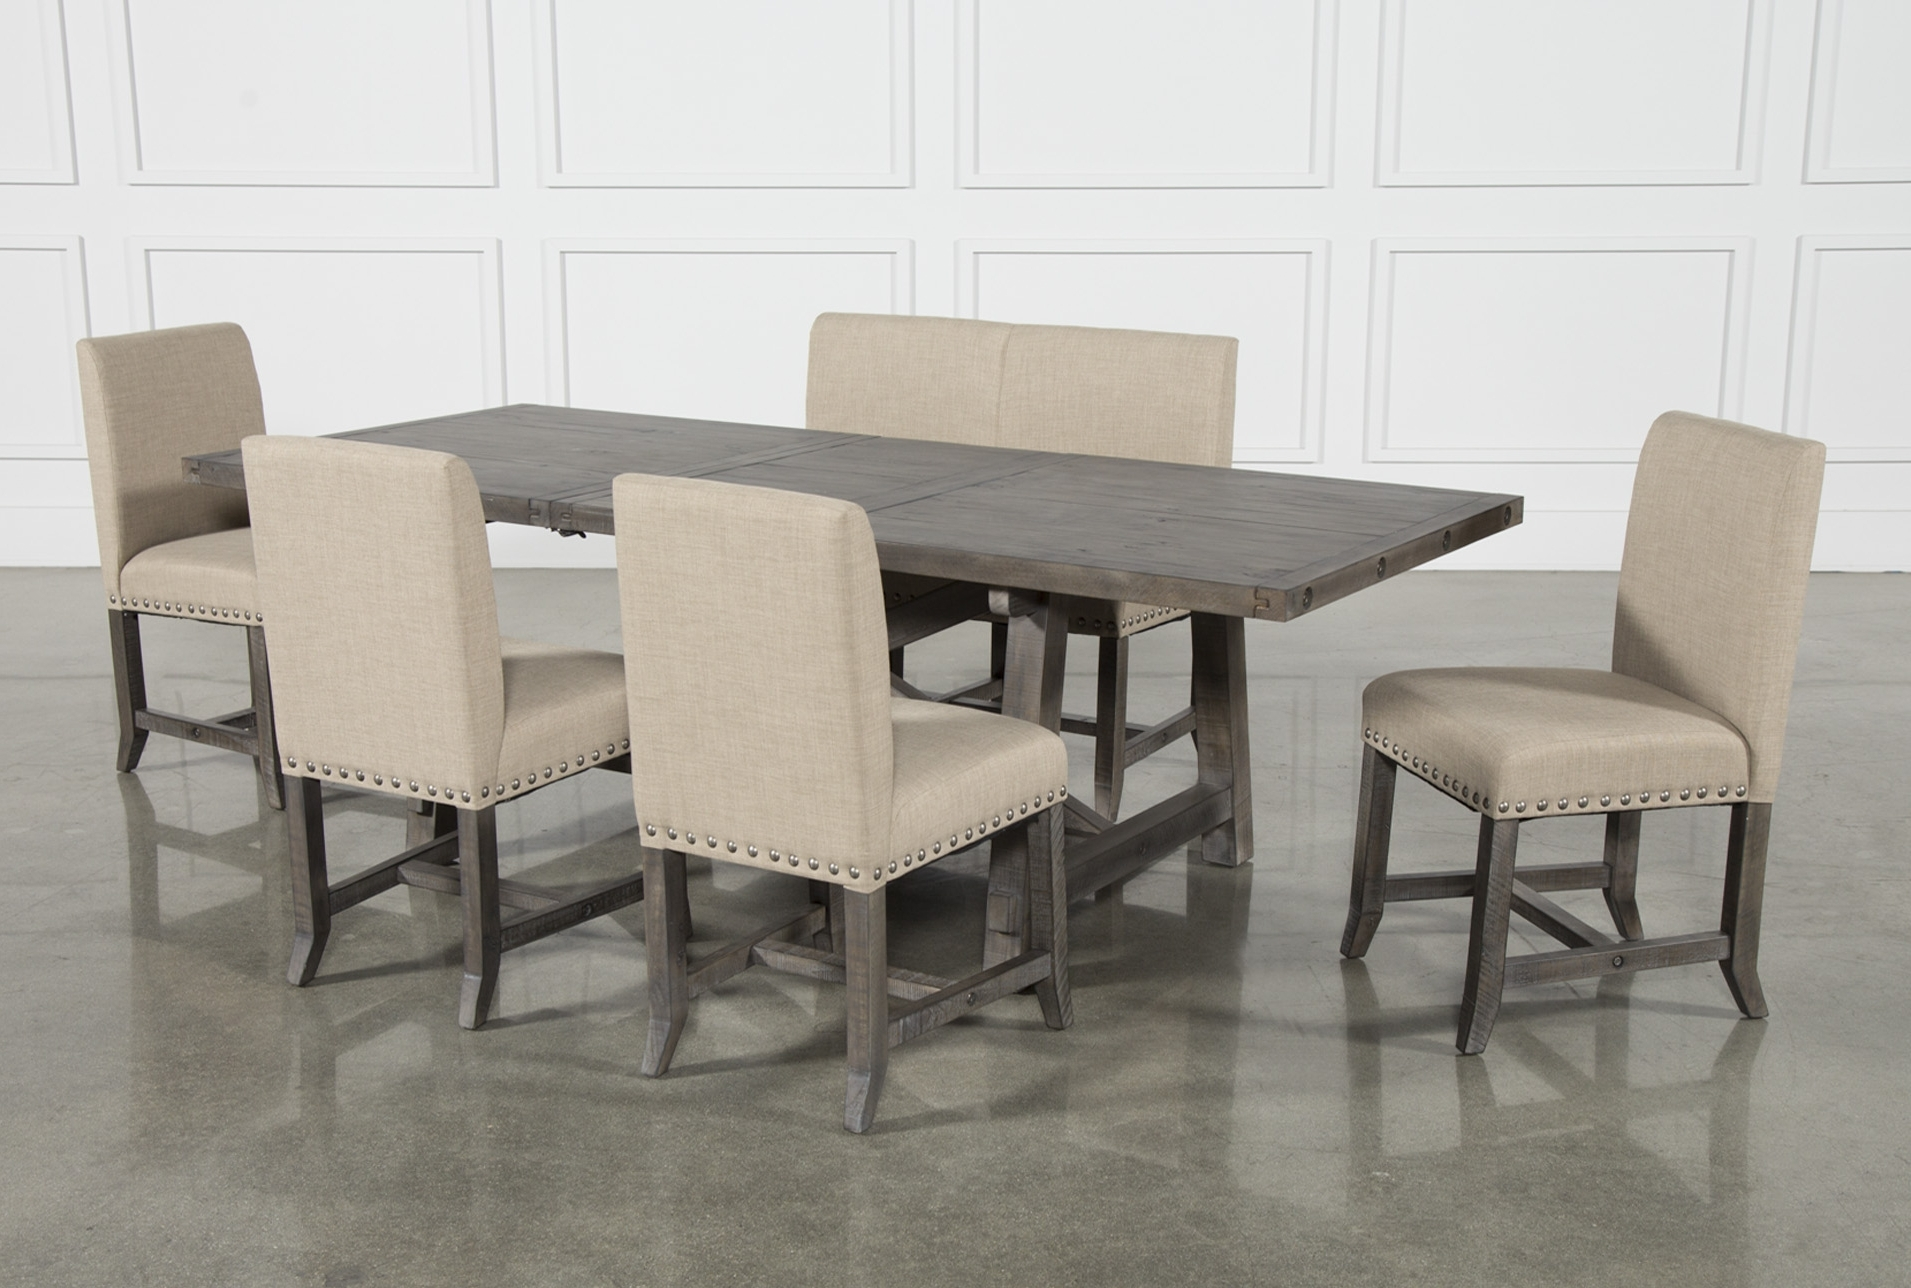 Most Popular Jaxon Grey 6 Piece Rectangle Extension Dining Set W/bench & Uph Regarding Jaxon Grey 6 Piece Rectangle Extension Dining Sets With Bench & Wood Chairs (View 2 of 25)